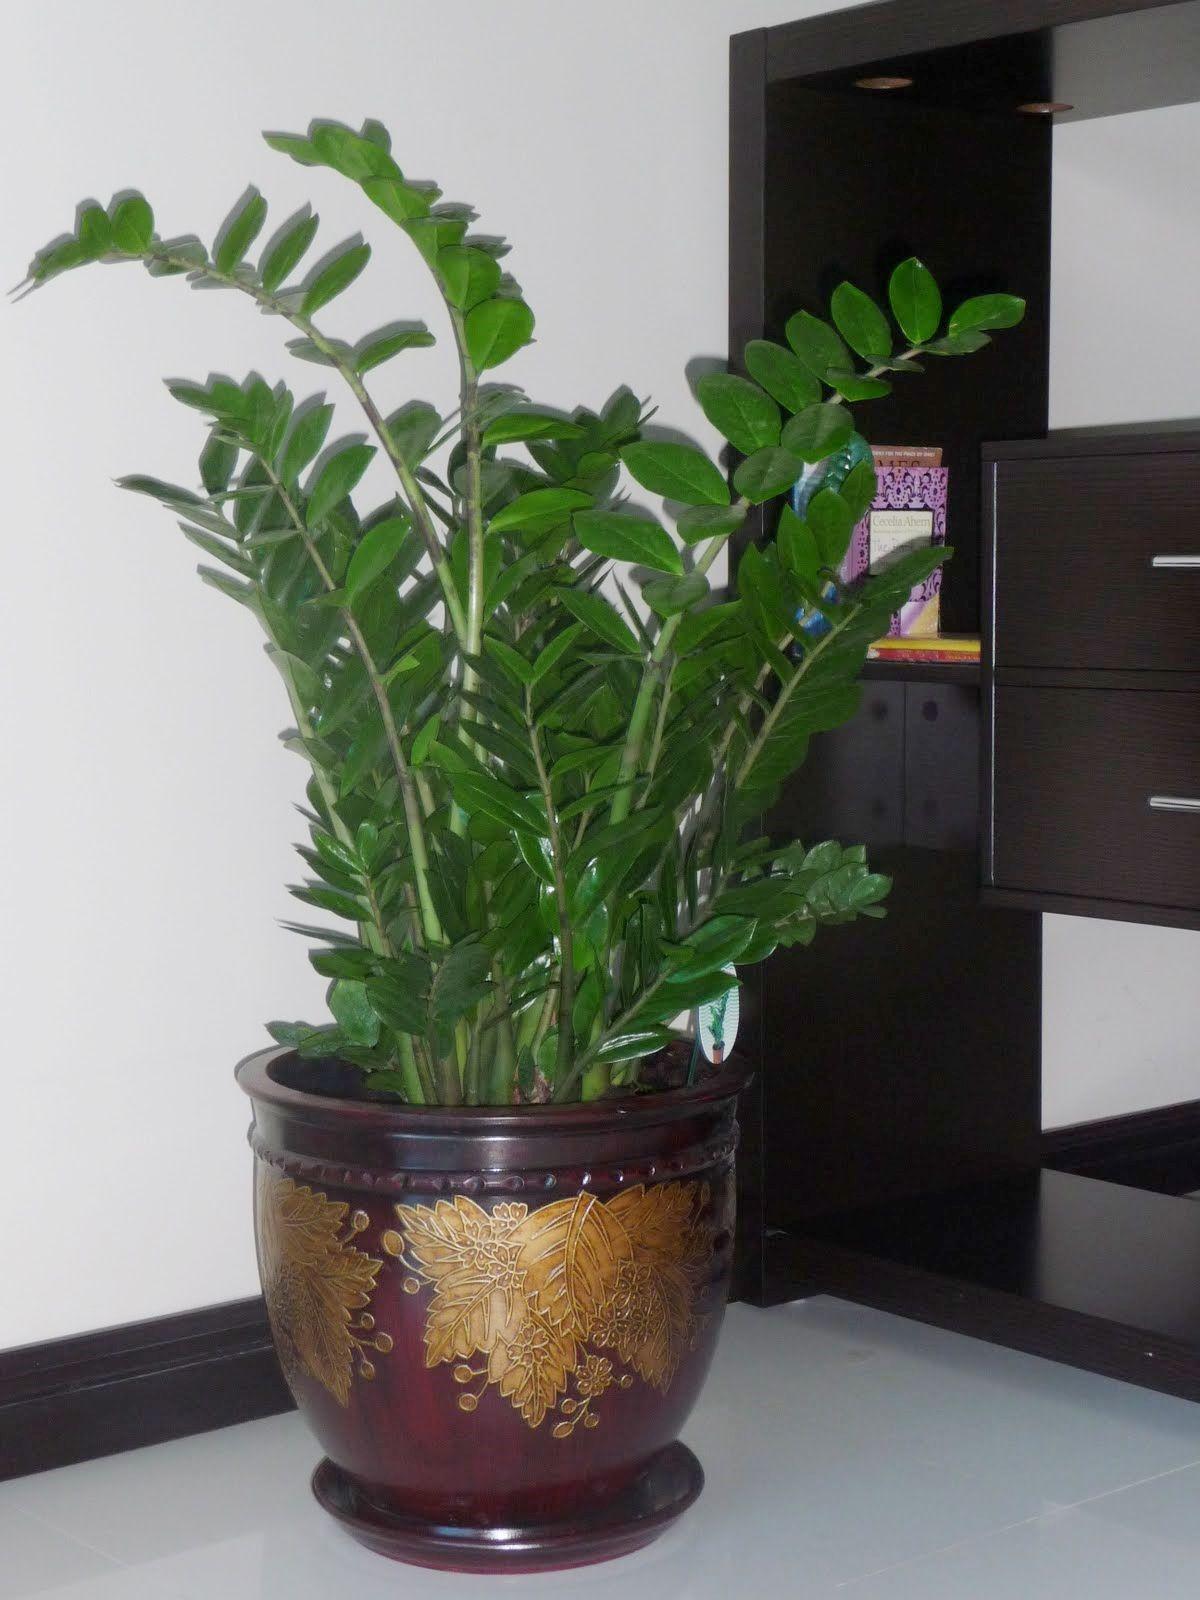 Zamioculcas (Zz) Plant Zz Plantindoor Plantshouse